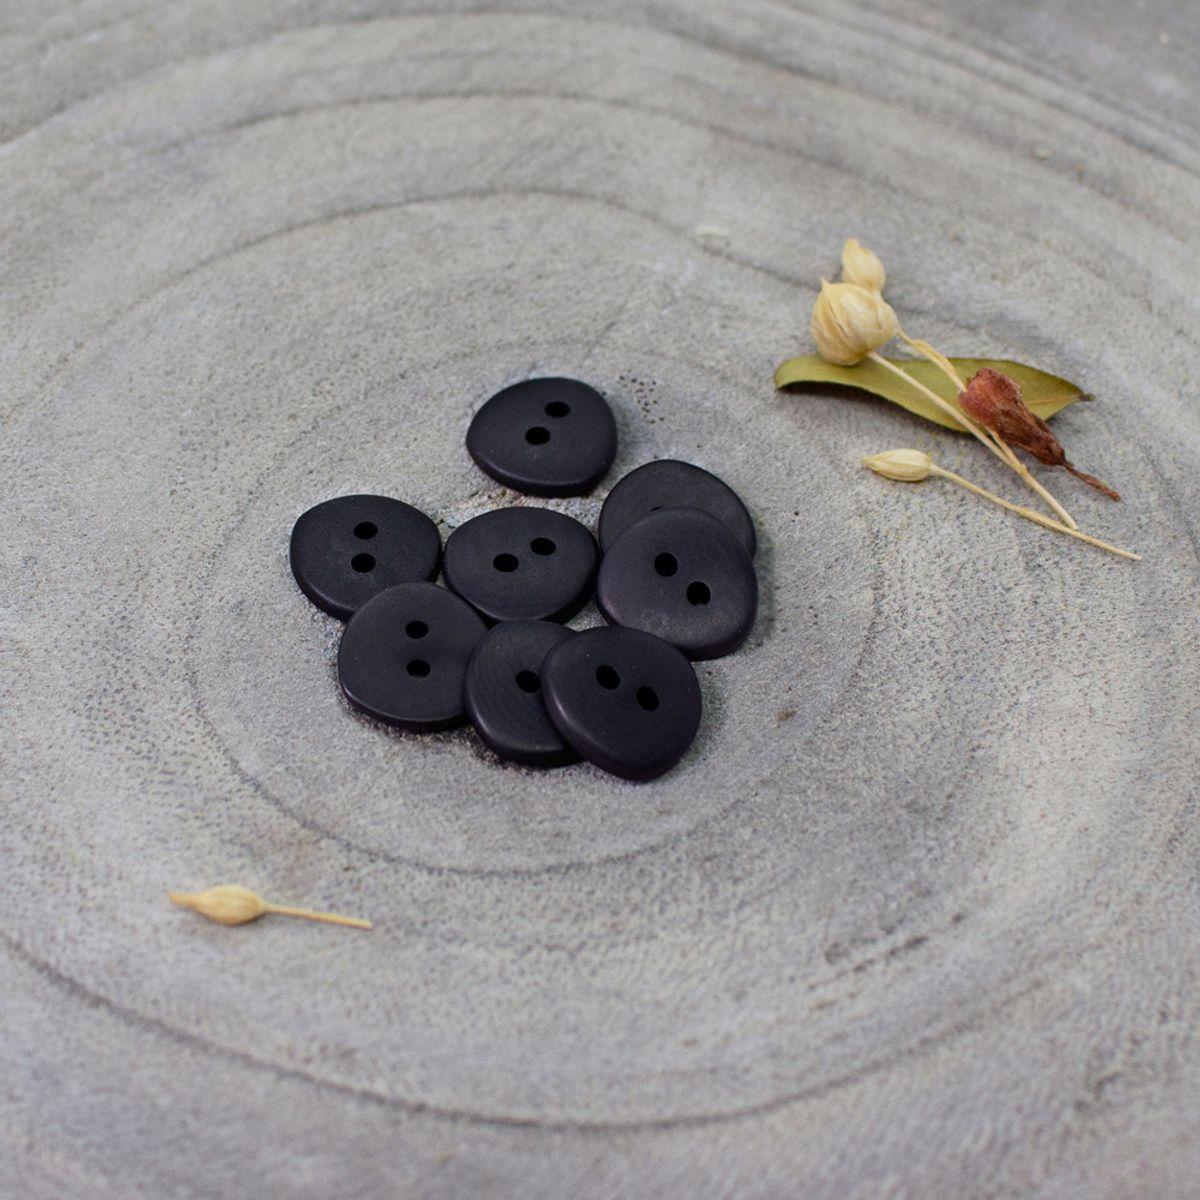 Bouton Corozo Jaipur - Black